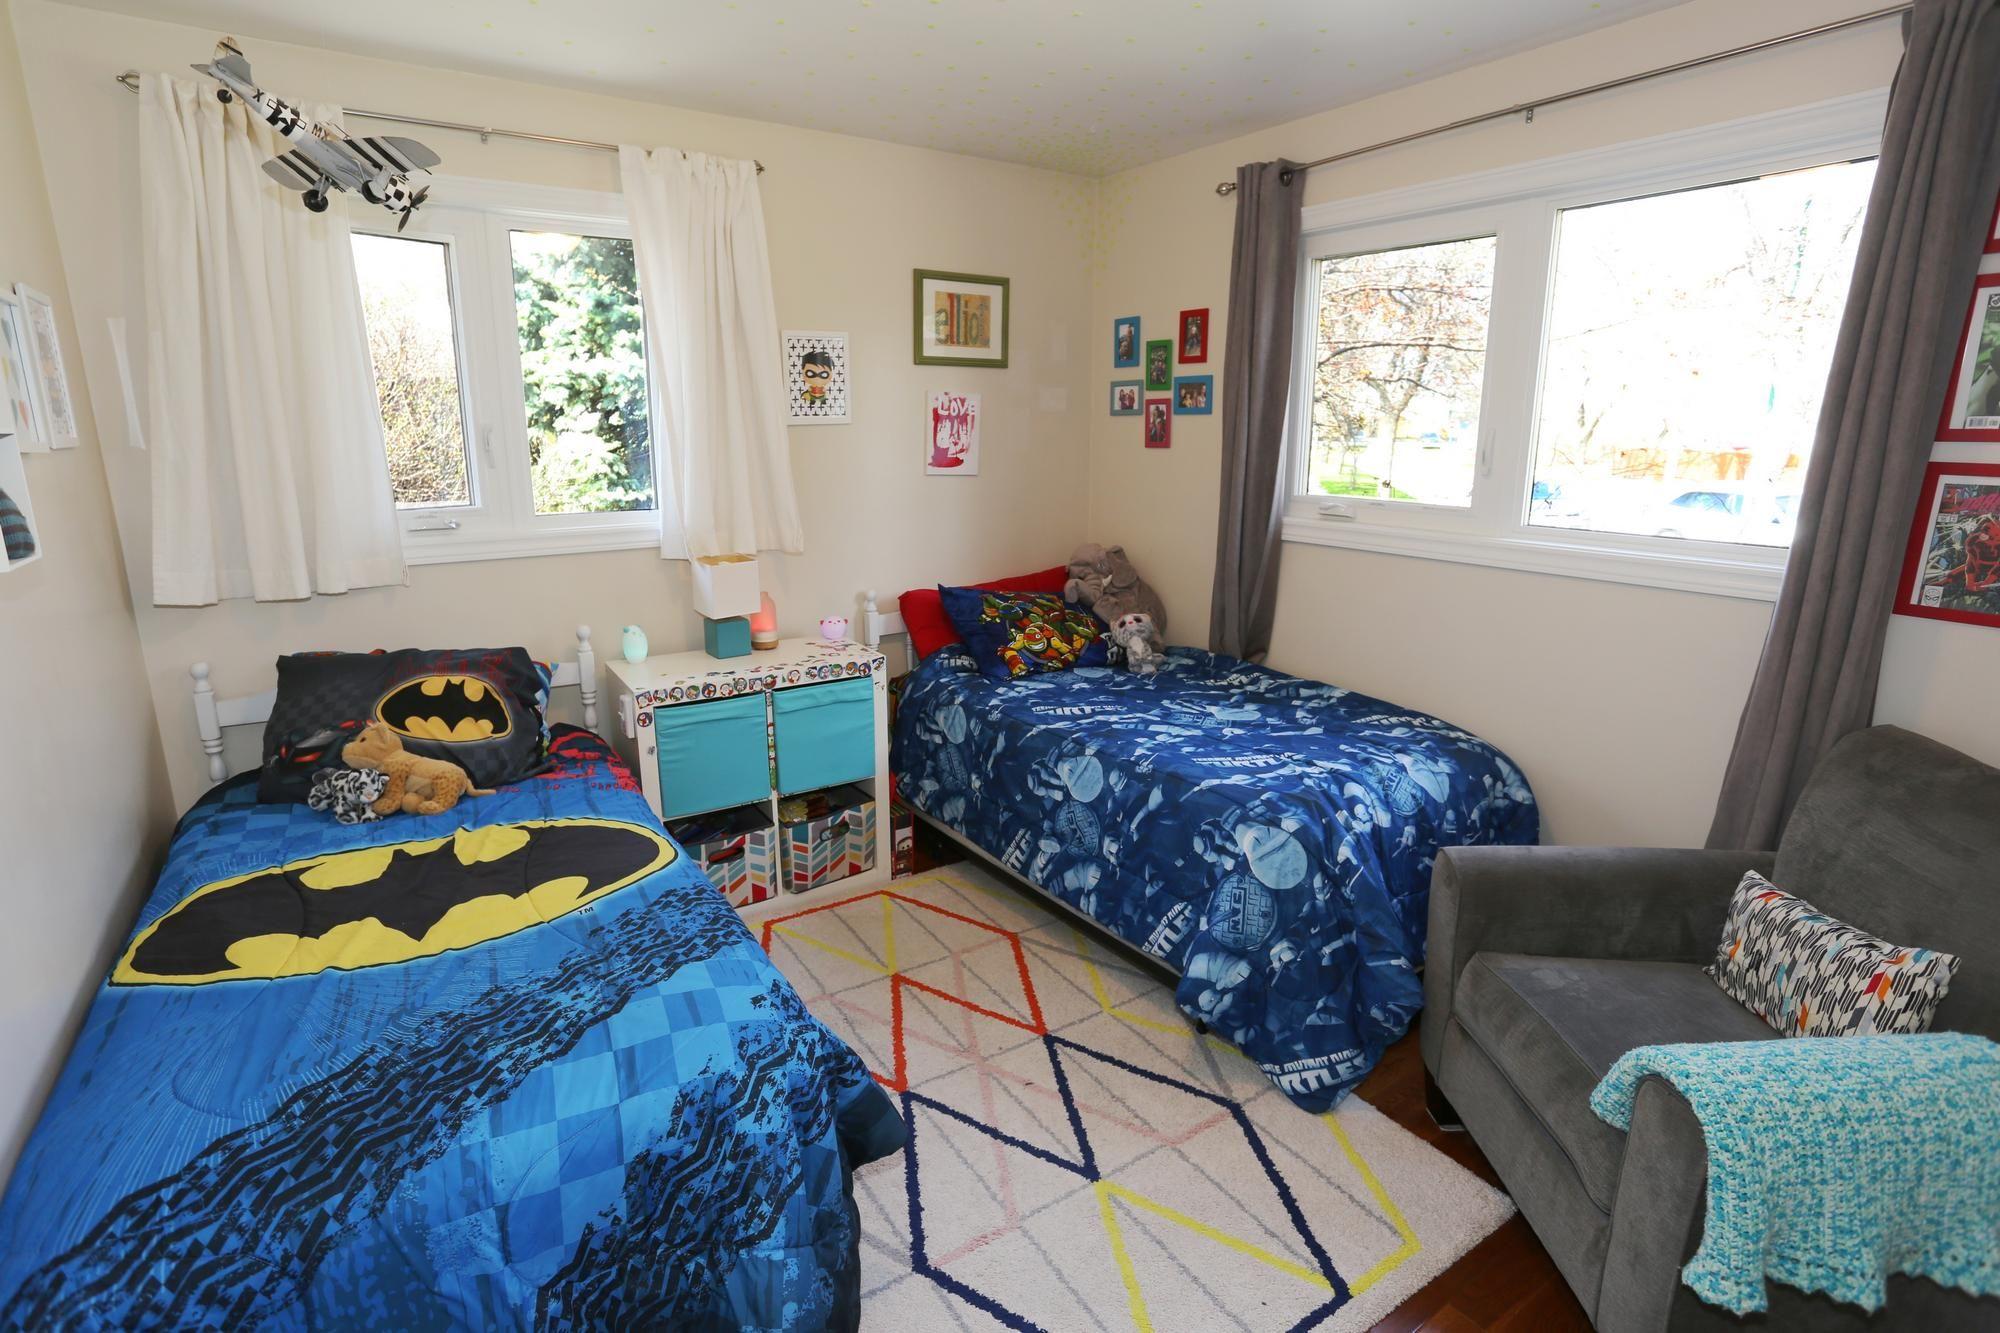 Photo 20: Photos: 1322 Valour Road in Winnipeg: Sargent Park Single Family Detached for sale (5C)  : MLS®# 1811835